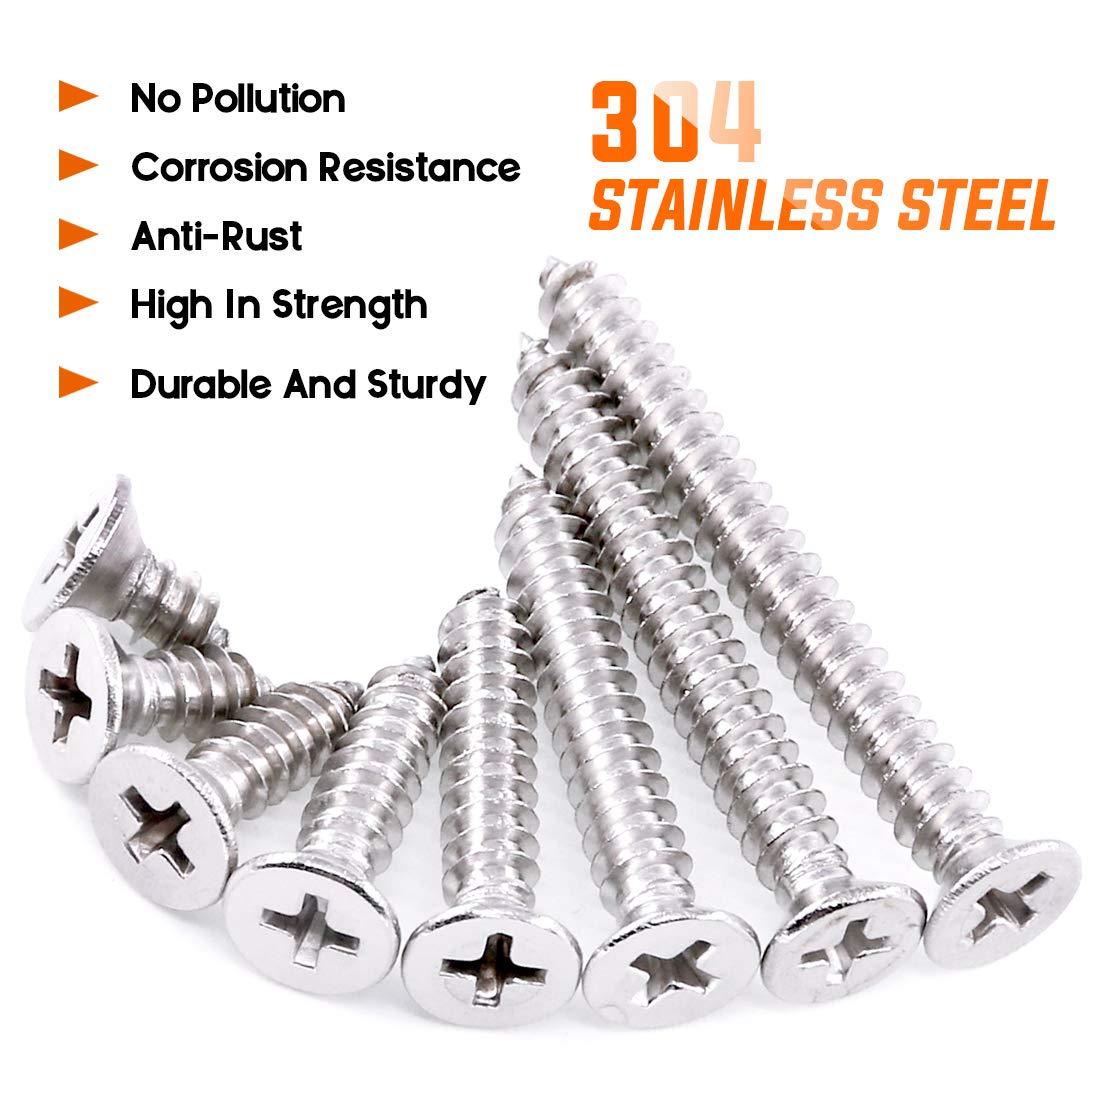 304 Stainless Steel Flat Head Phillips Cross Wood Screw Self Tapping Drilling Screws Assortment Kit Rustark 150Pcs #10 3//8 to 1-3//4